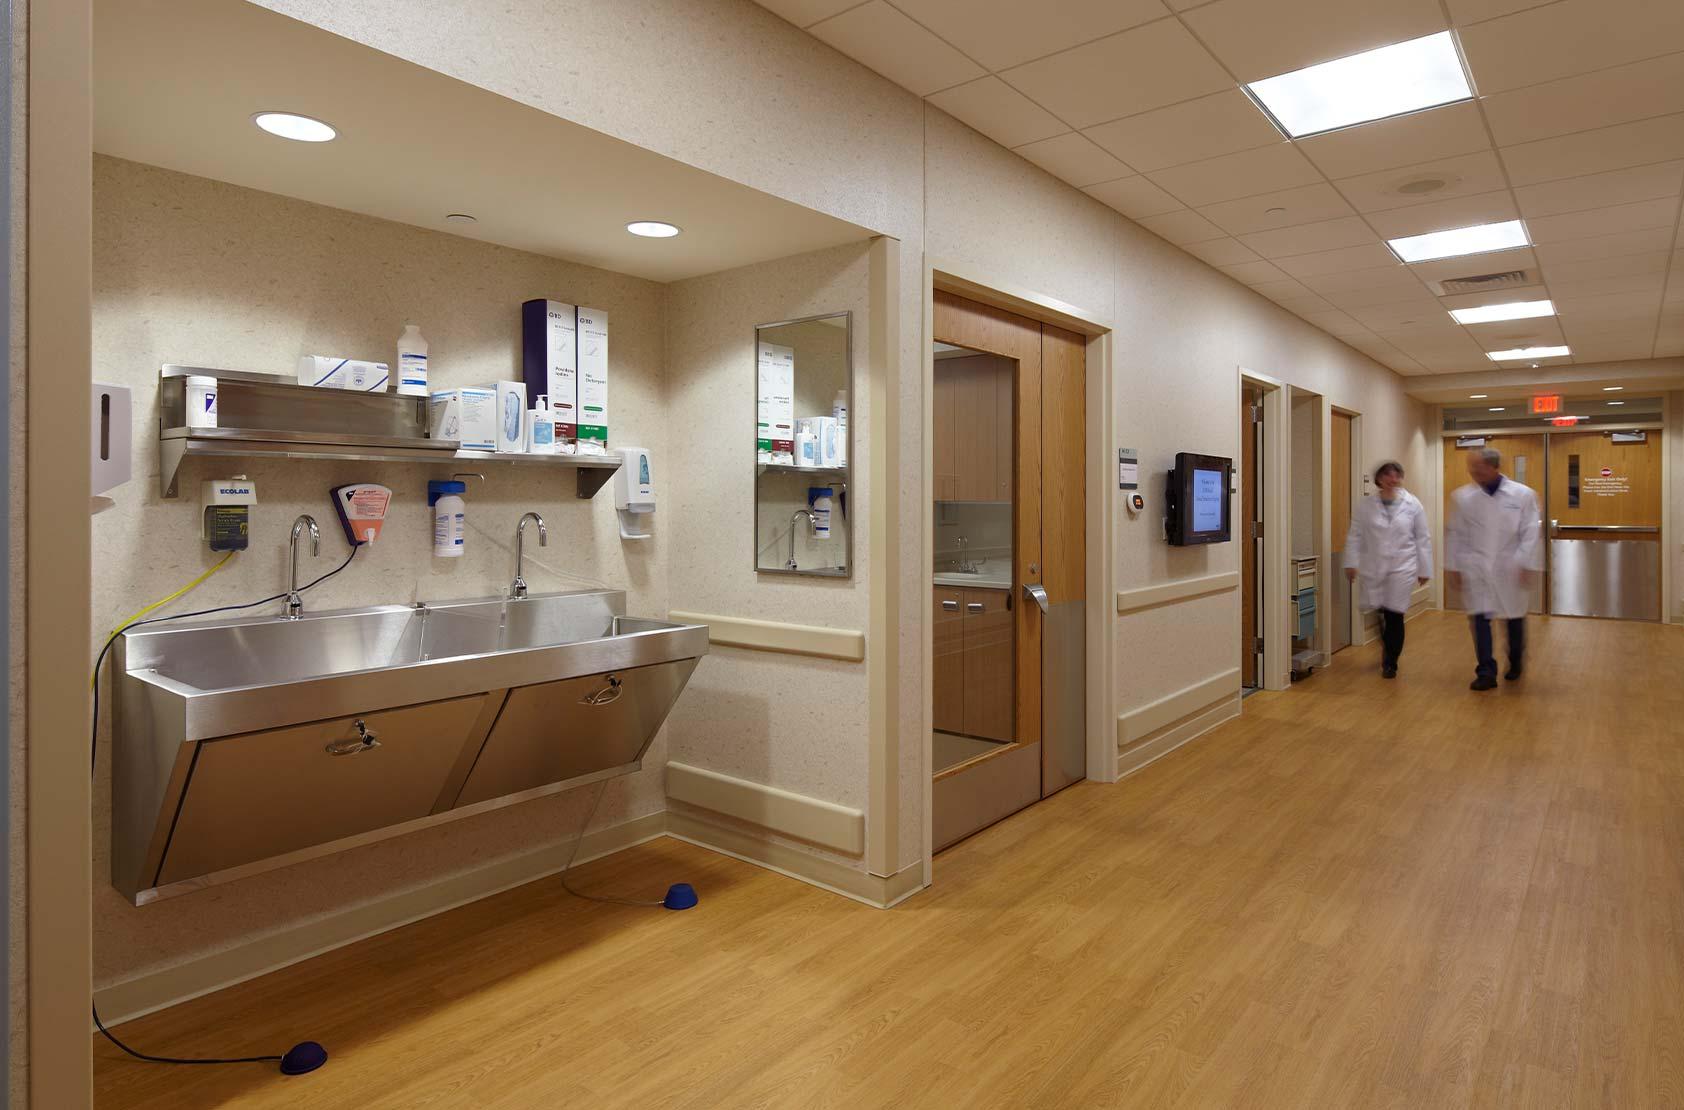 UW Health - Clinical Simulation Center